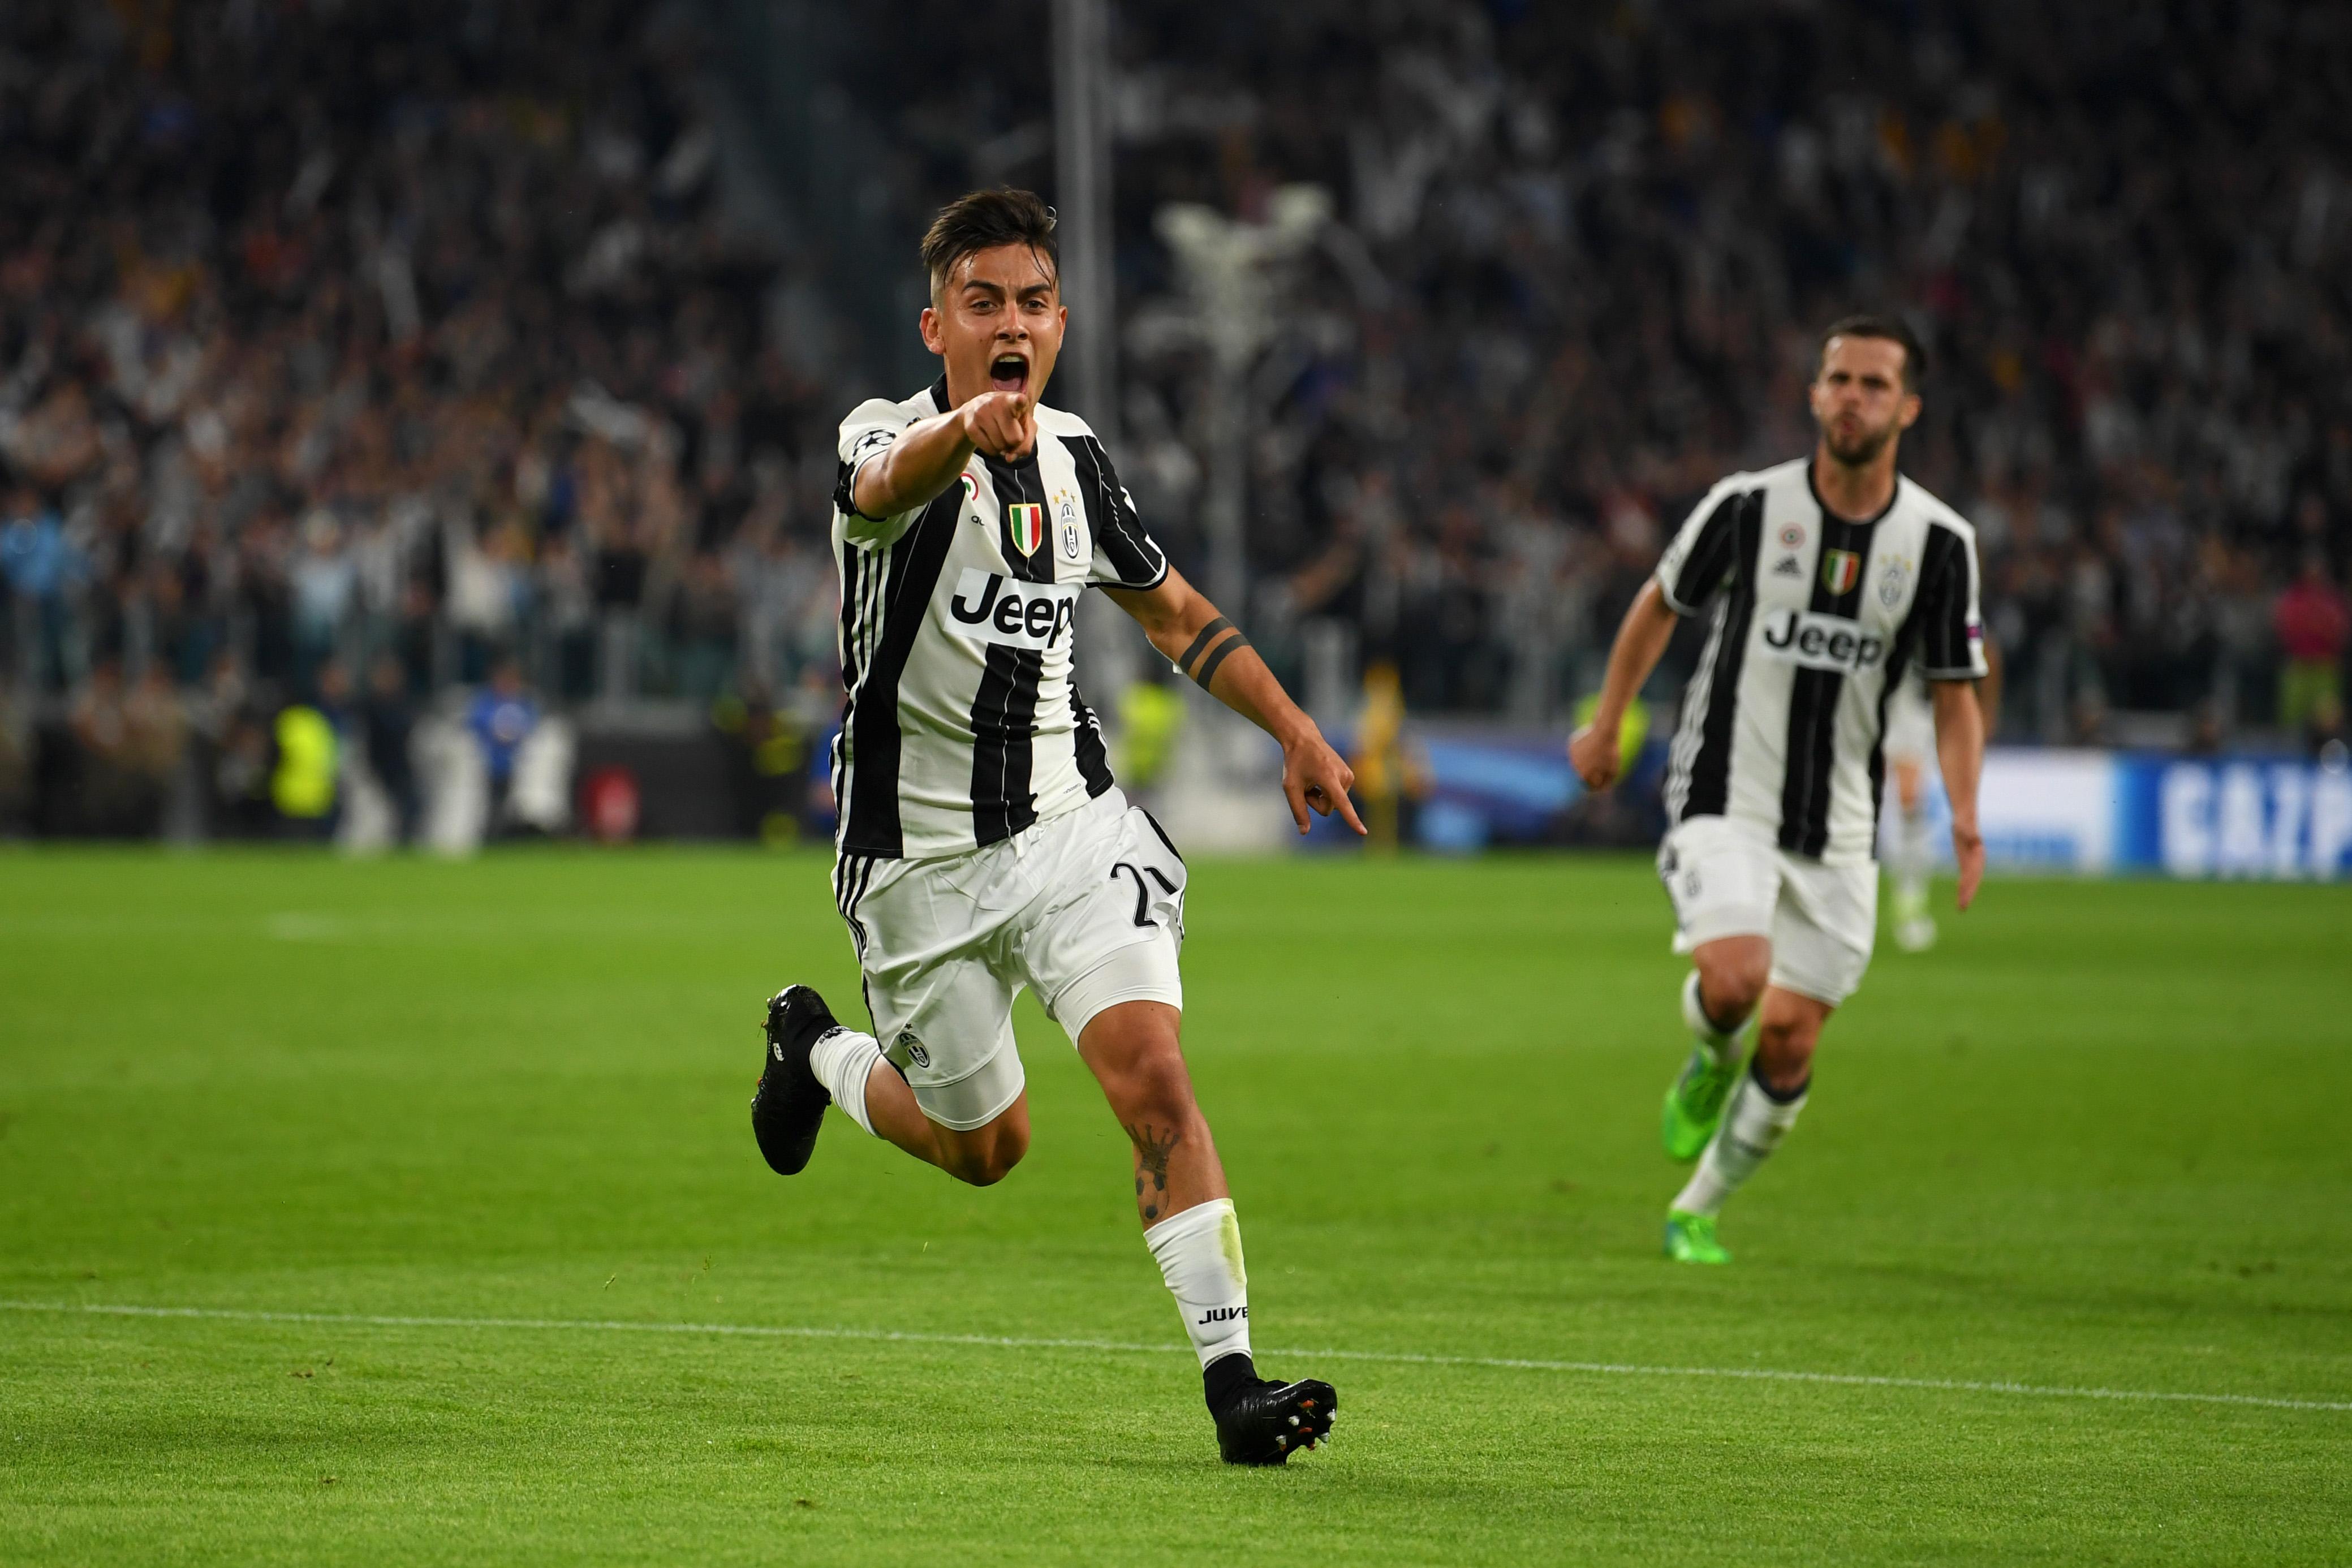 Juventus Fc: Barcelona Vs. Juventus Live Stream: Watch Champions League